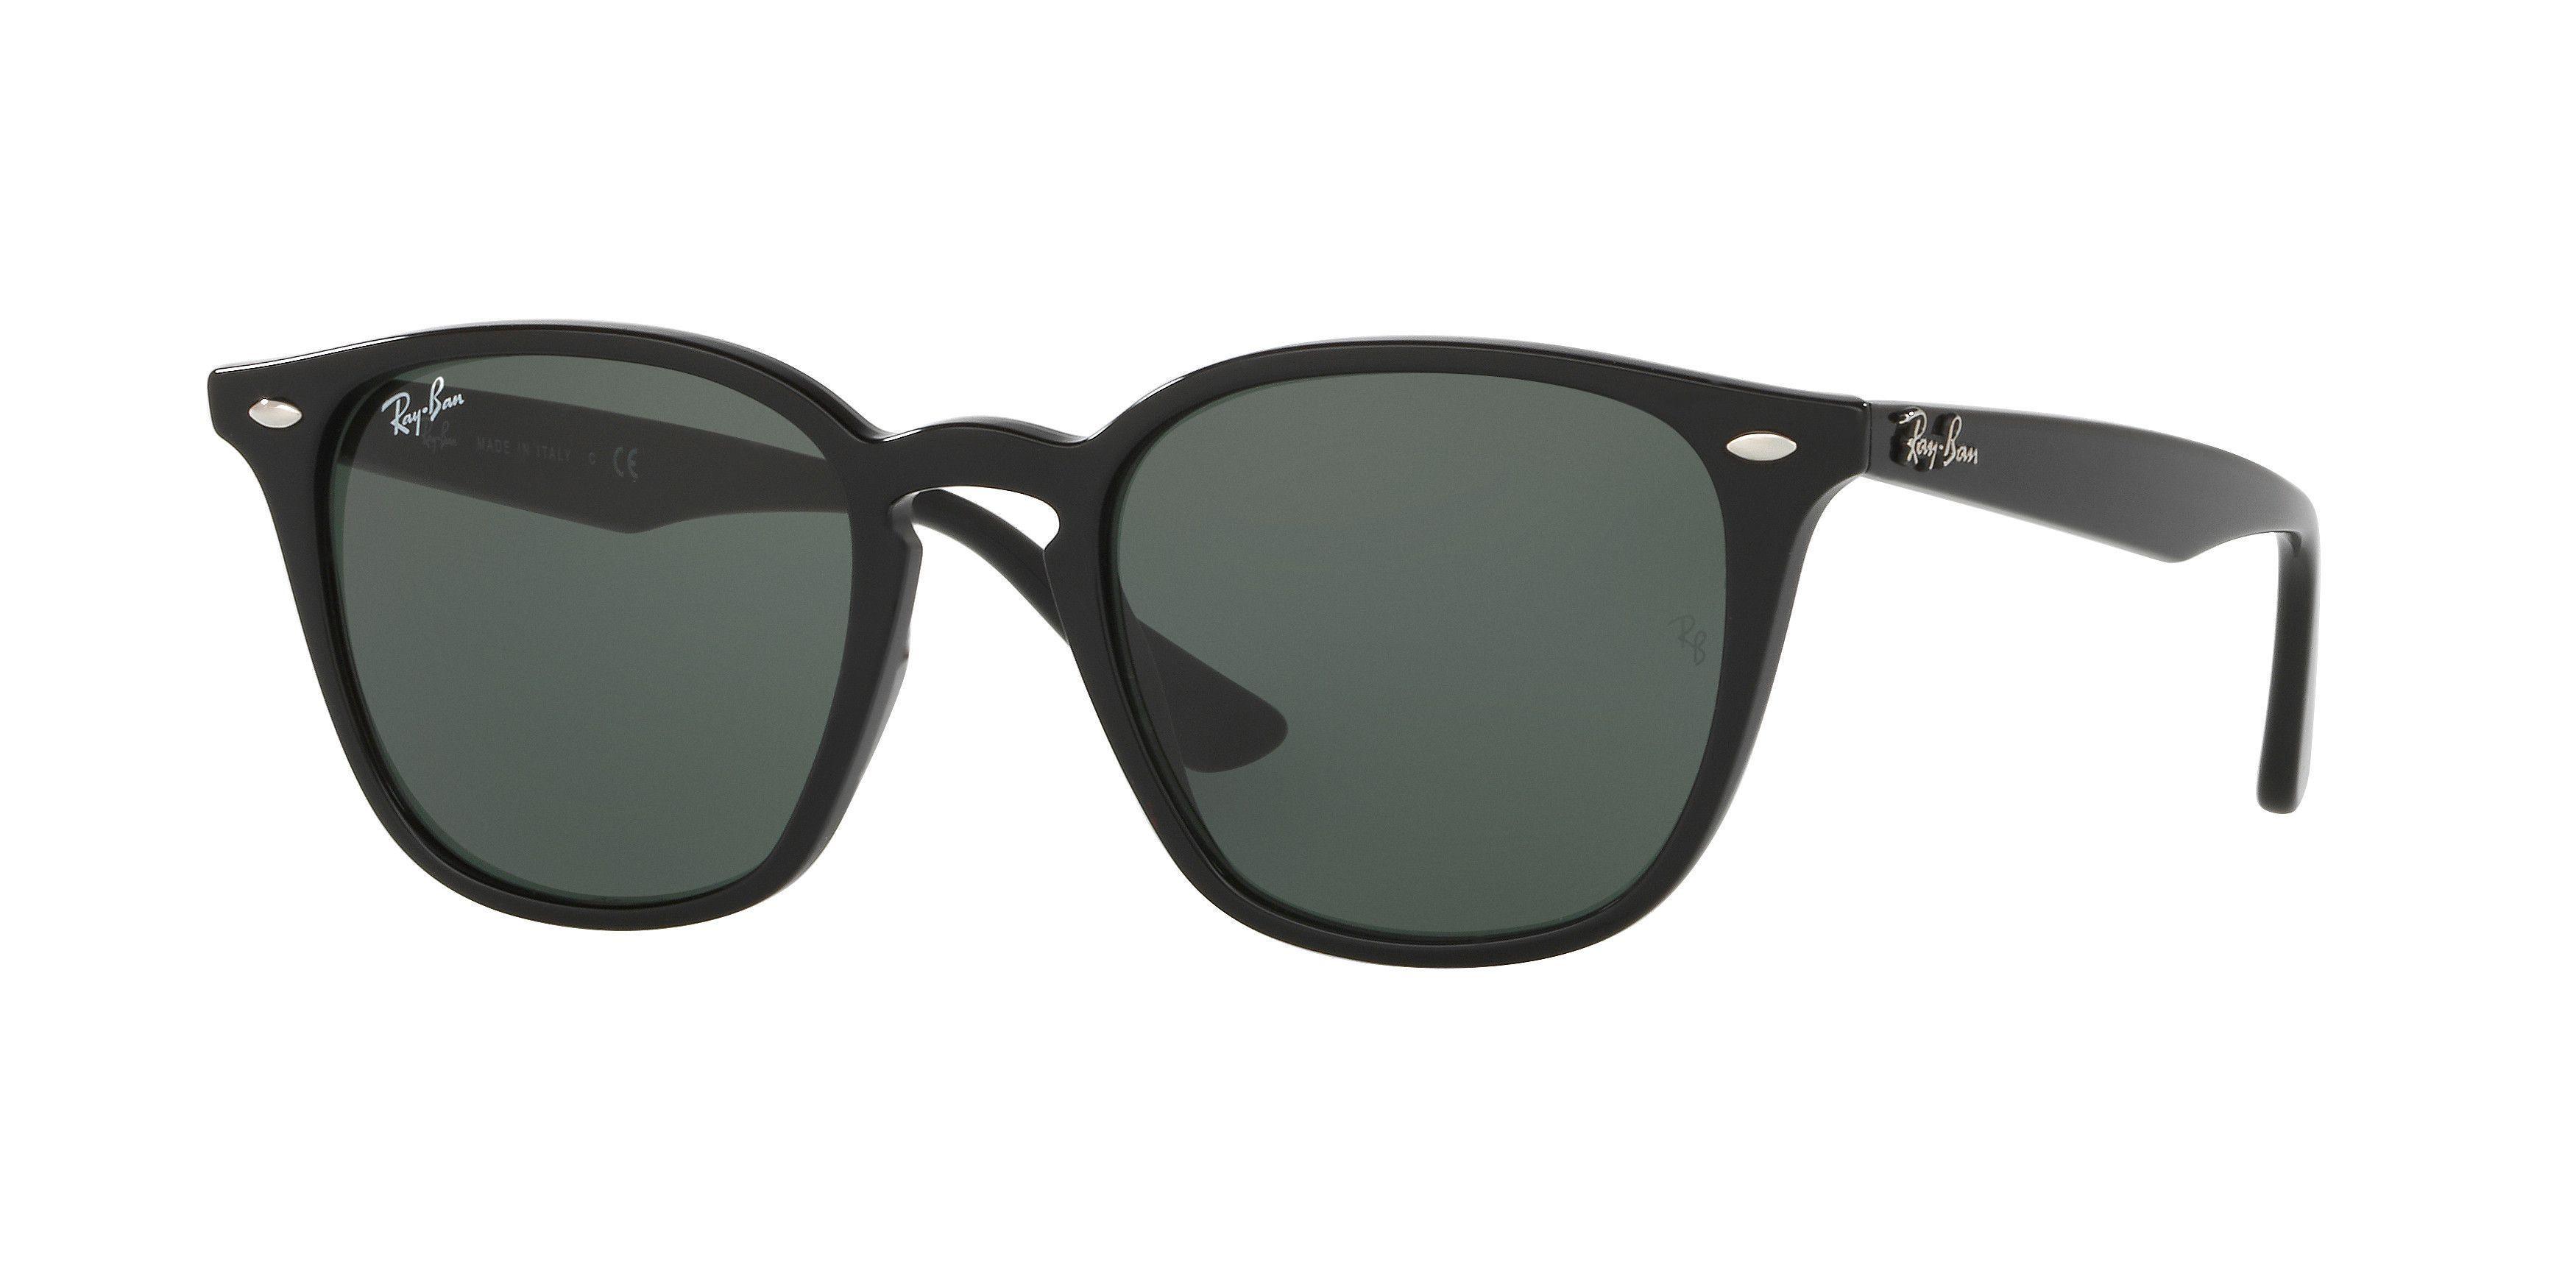 313188e0fd Ray-Ban RB4258 Sunglasses